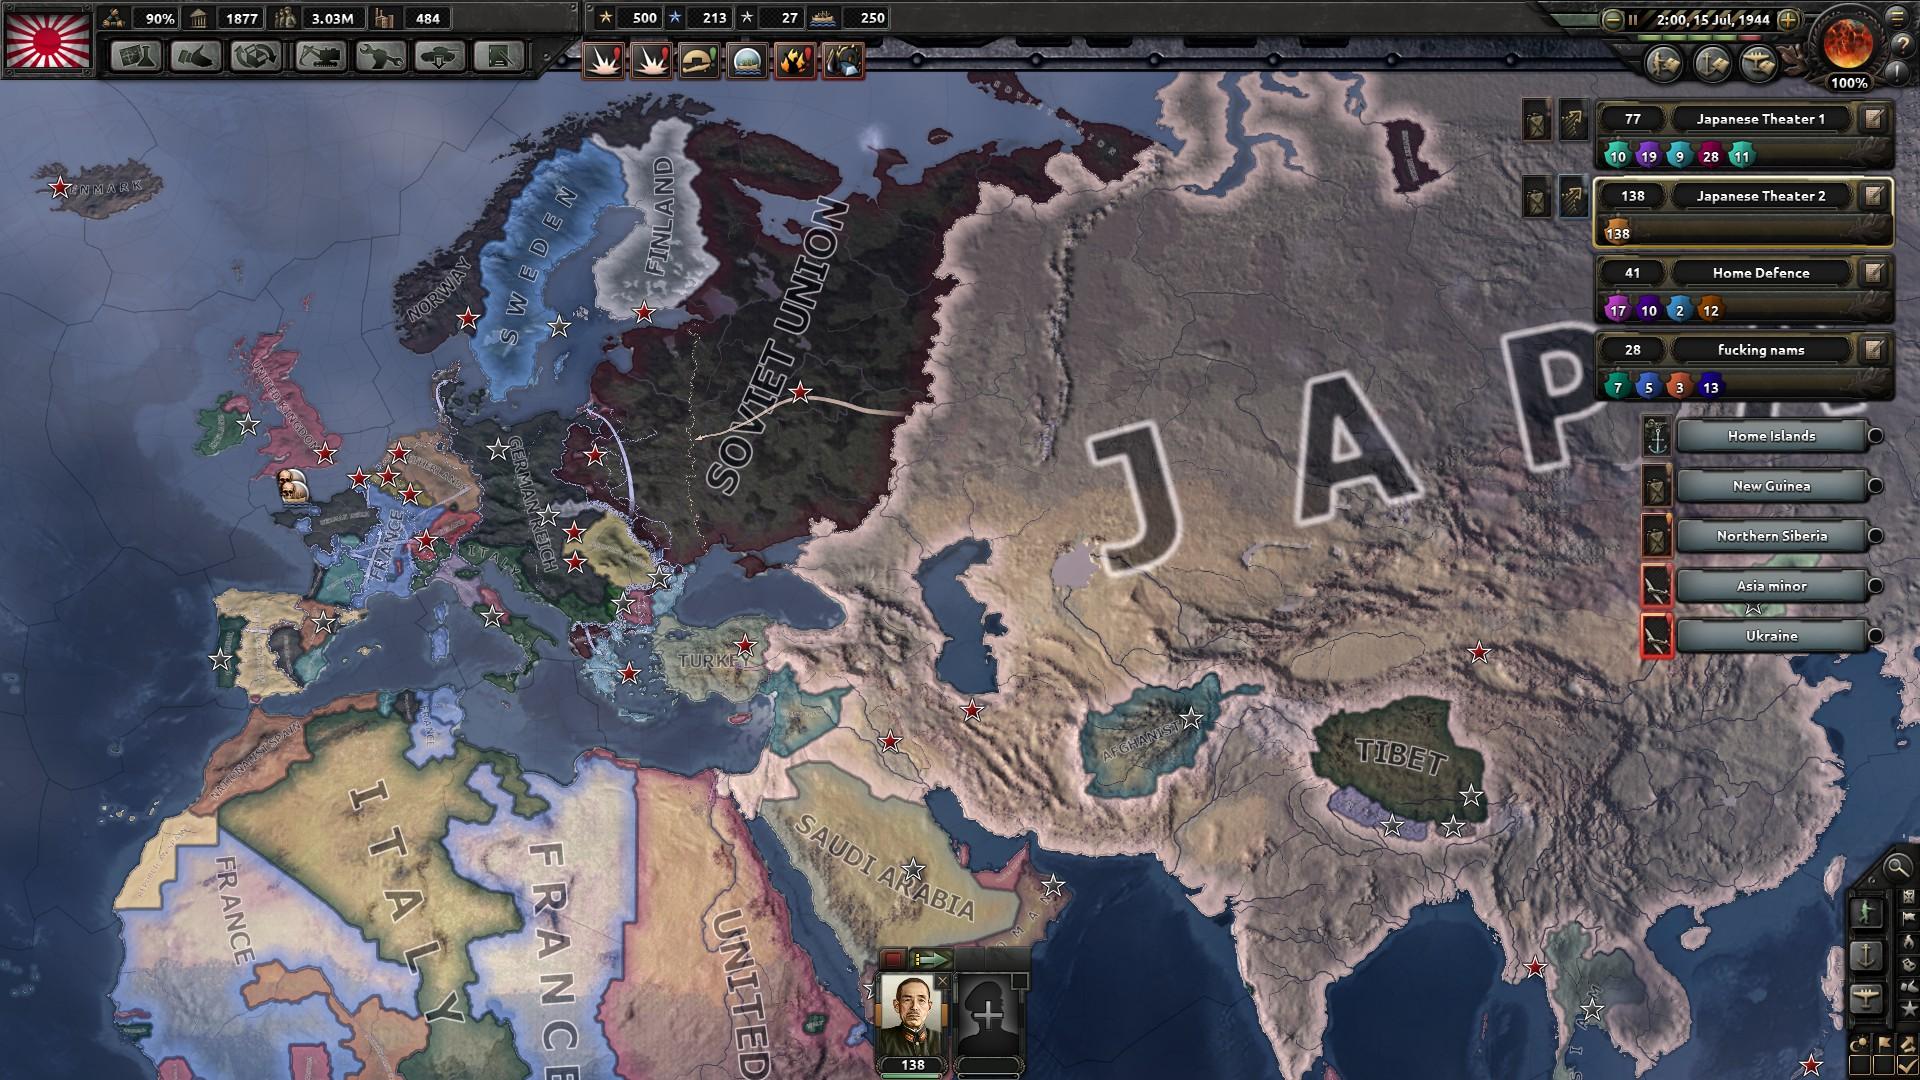 As Axis I hate Japan hoi4